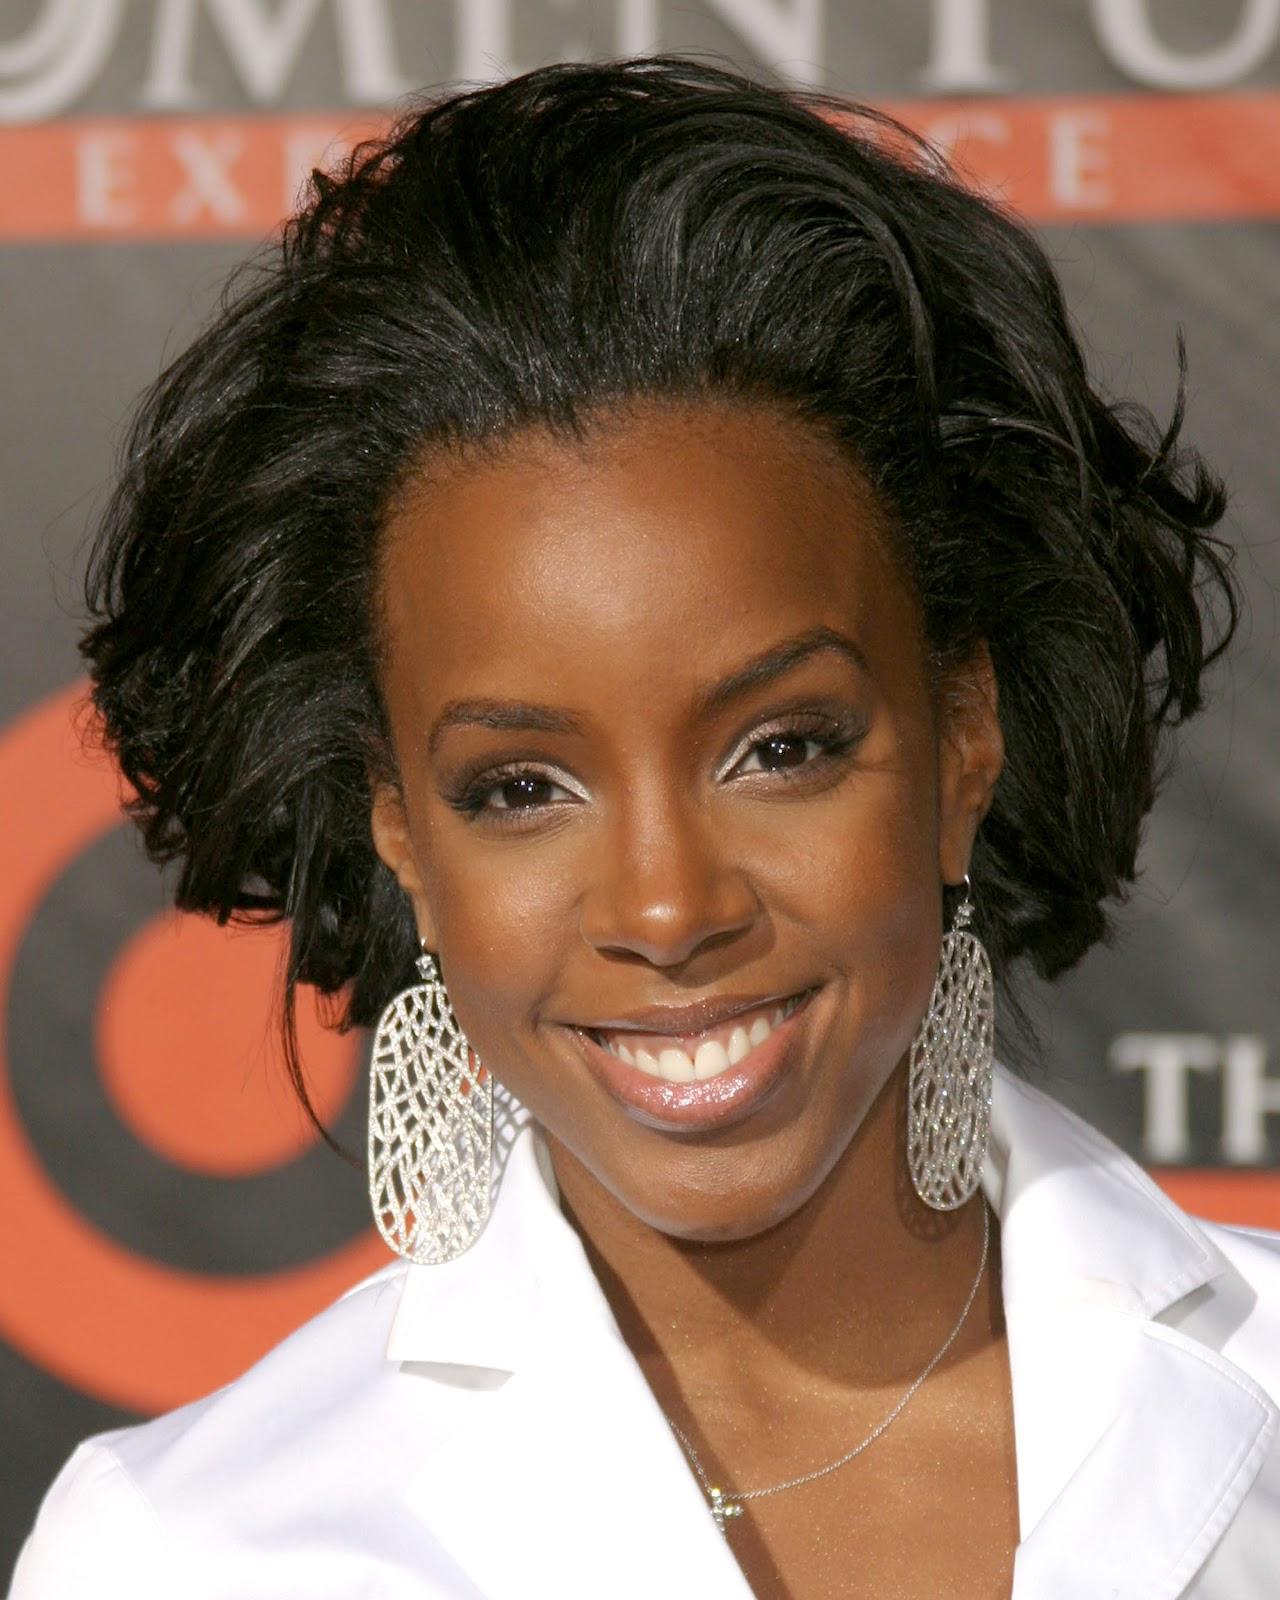 Kelly Rowland Hairstyles Fade Haircut